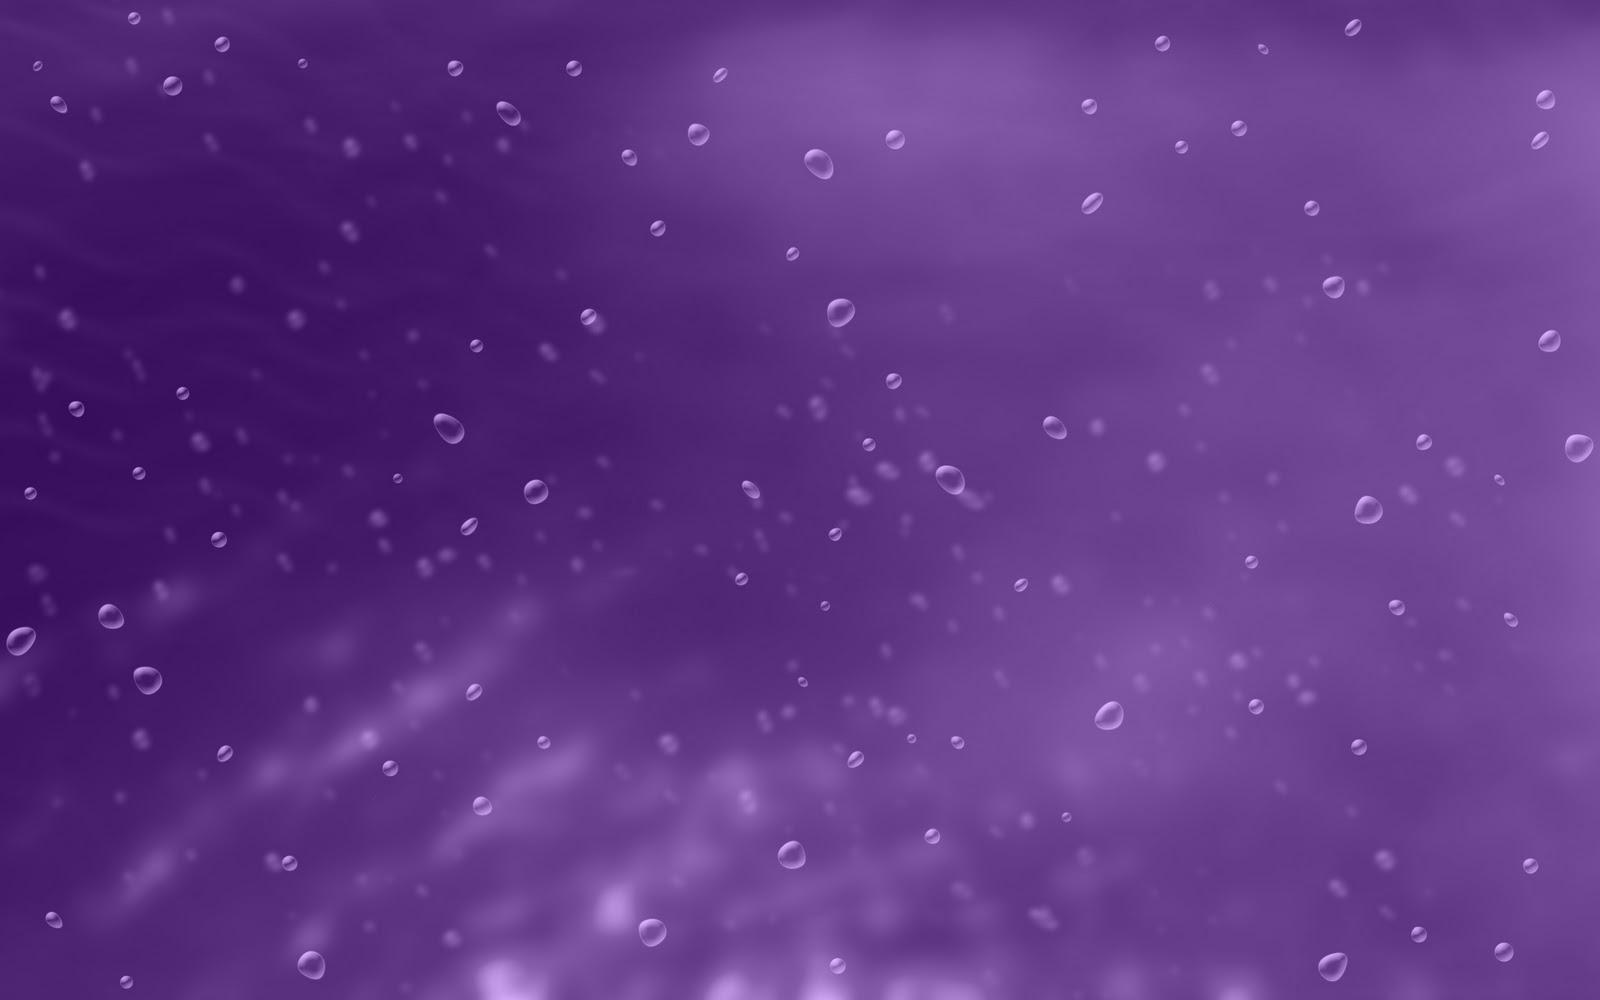 Wallpaper Beautiful Purple Backgrounds Purple Wallpapers for Desktop 1600x1000